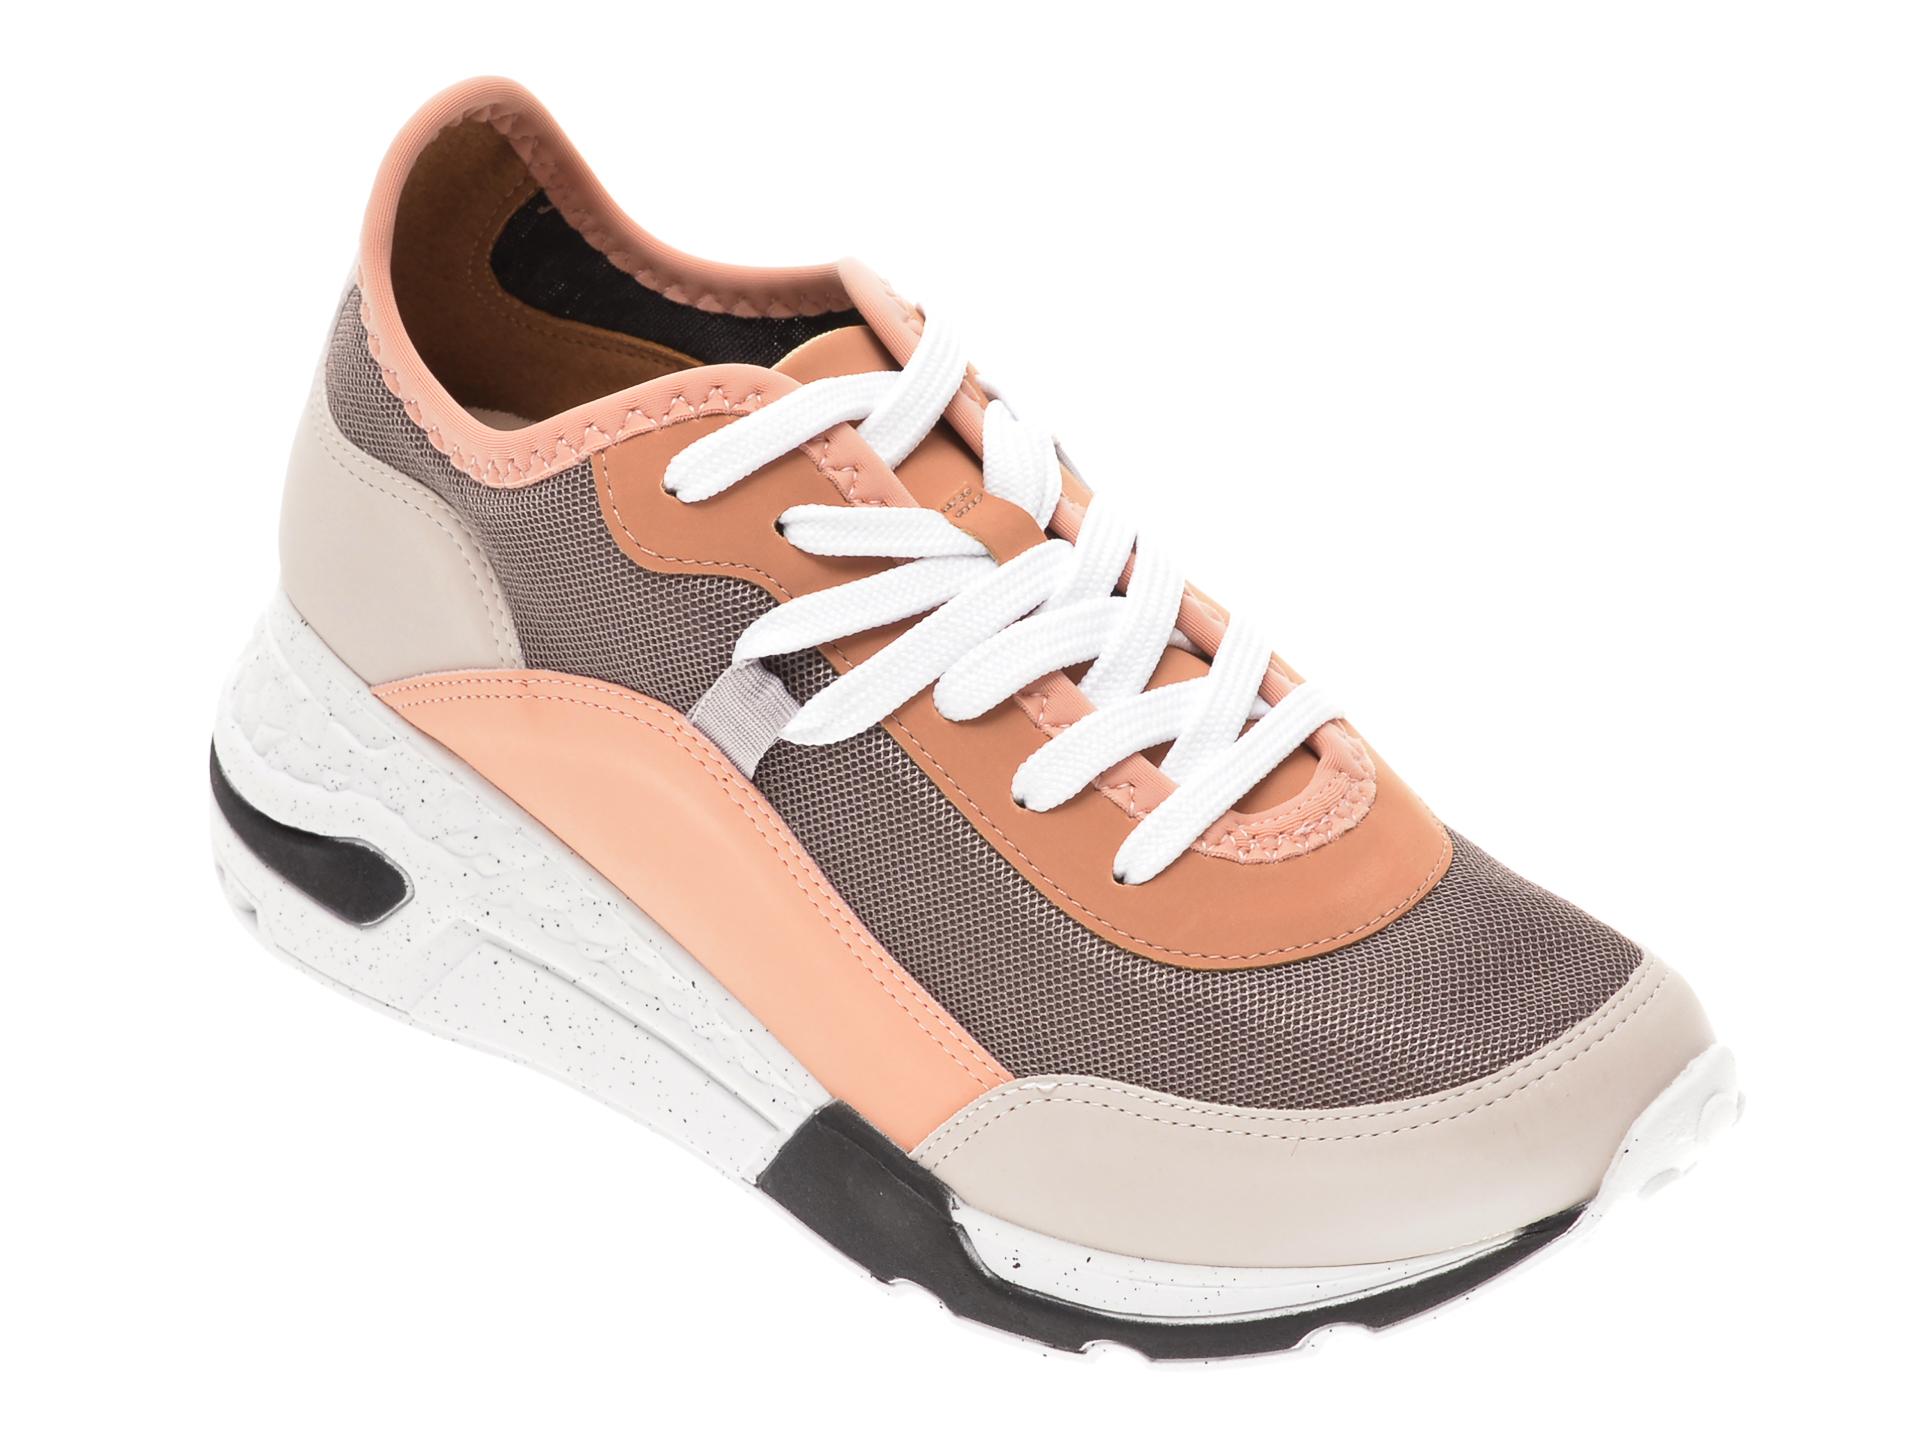 Pantofi sport ALDO multicolor, Cadorelia020, din material textil si piele ecologica New